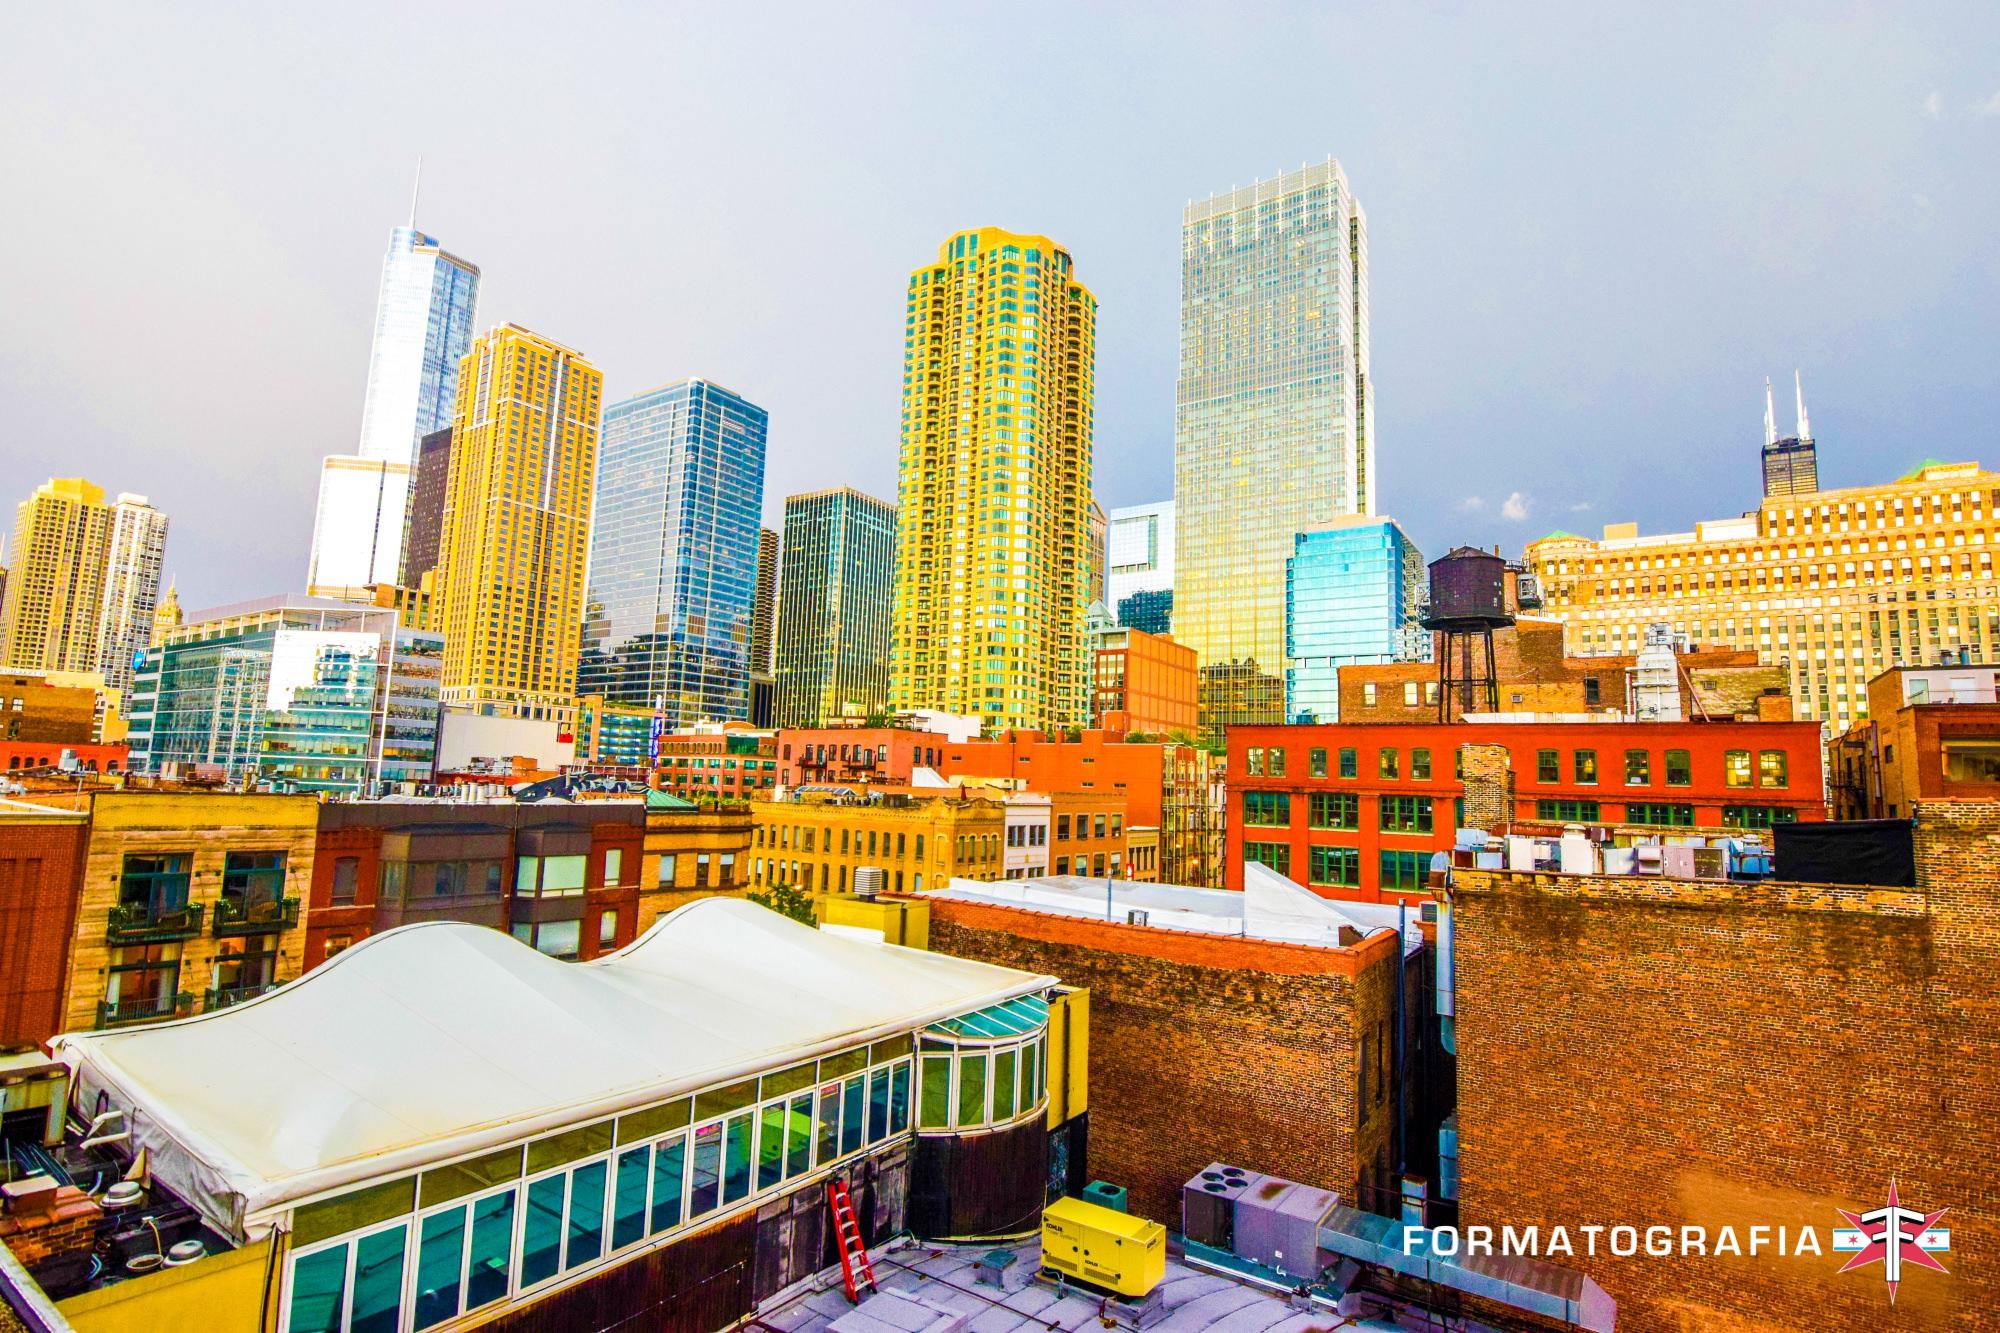 eric formato chicago photographer fall update city architecture shotsDSC_0017-2.jpg